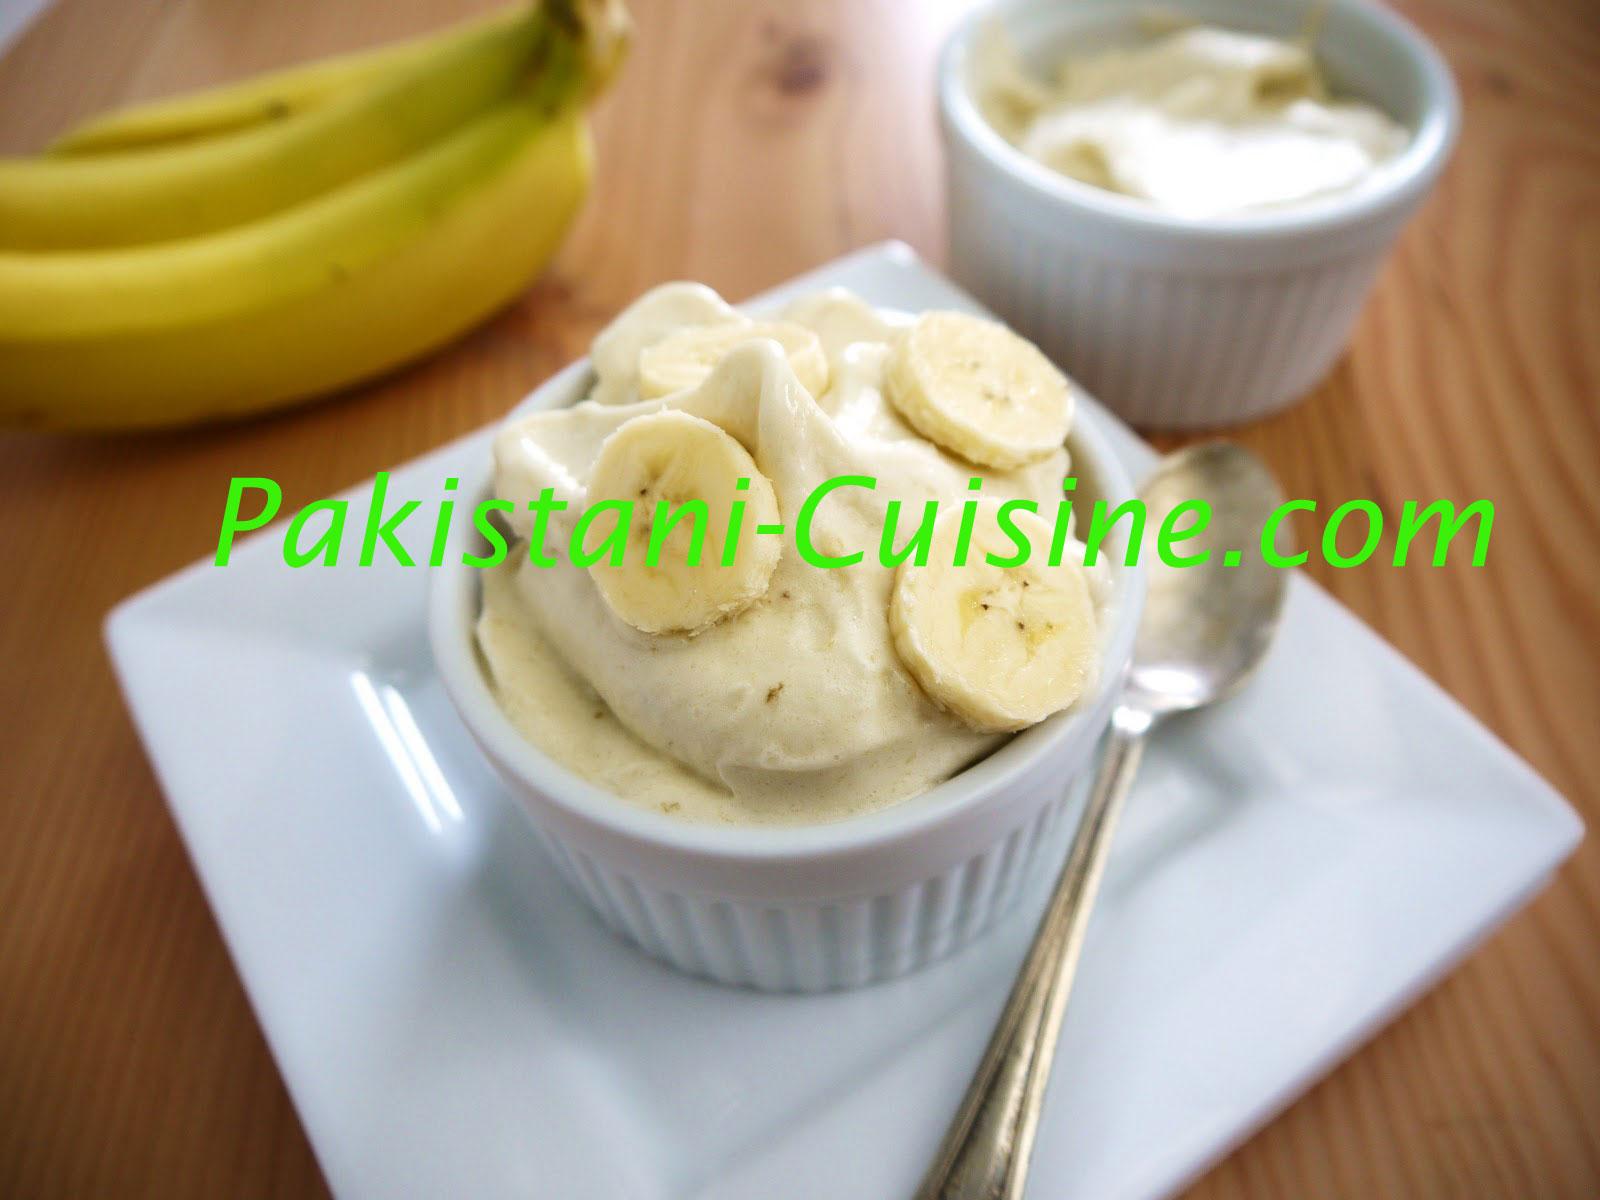 how to make banana ice cream with only bananas